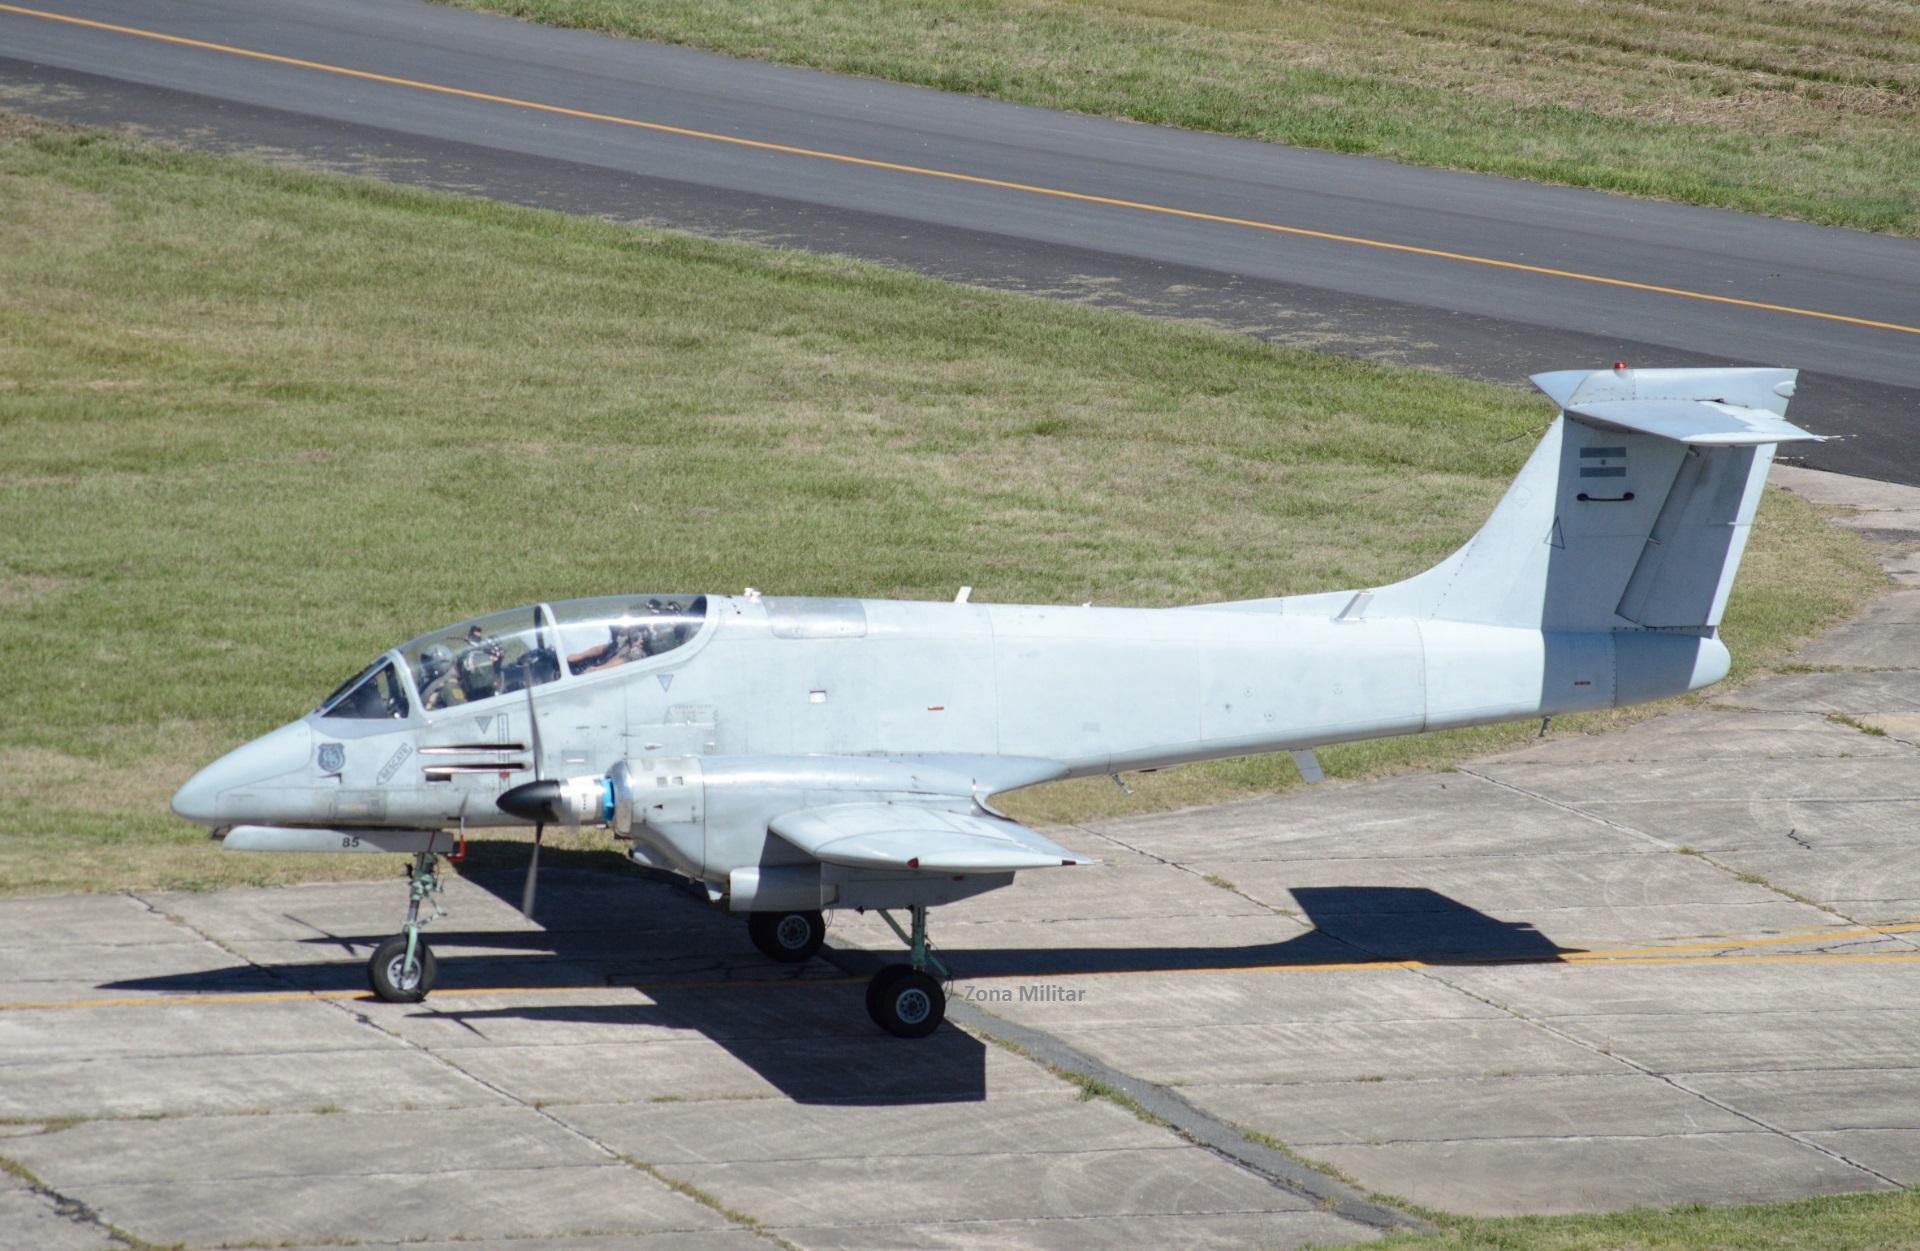 Argentina - Página 8 IA-58-Pucara-EAM-3